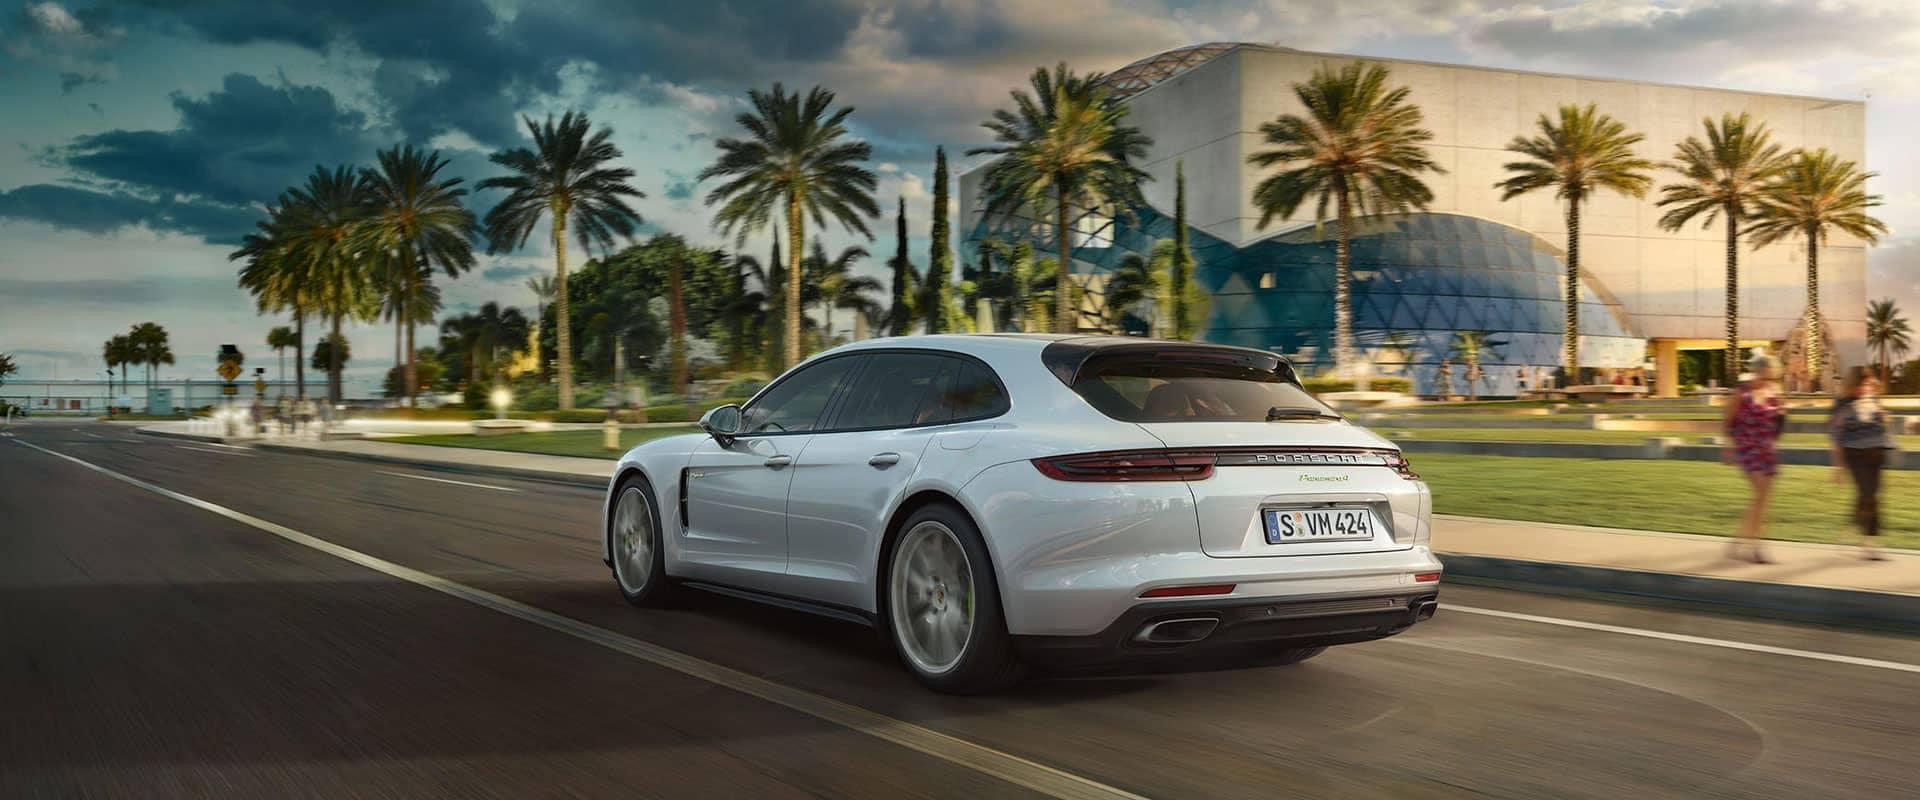 2019 Porsche Panamera Exterior Back